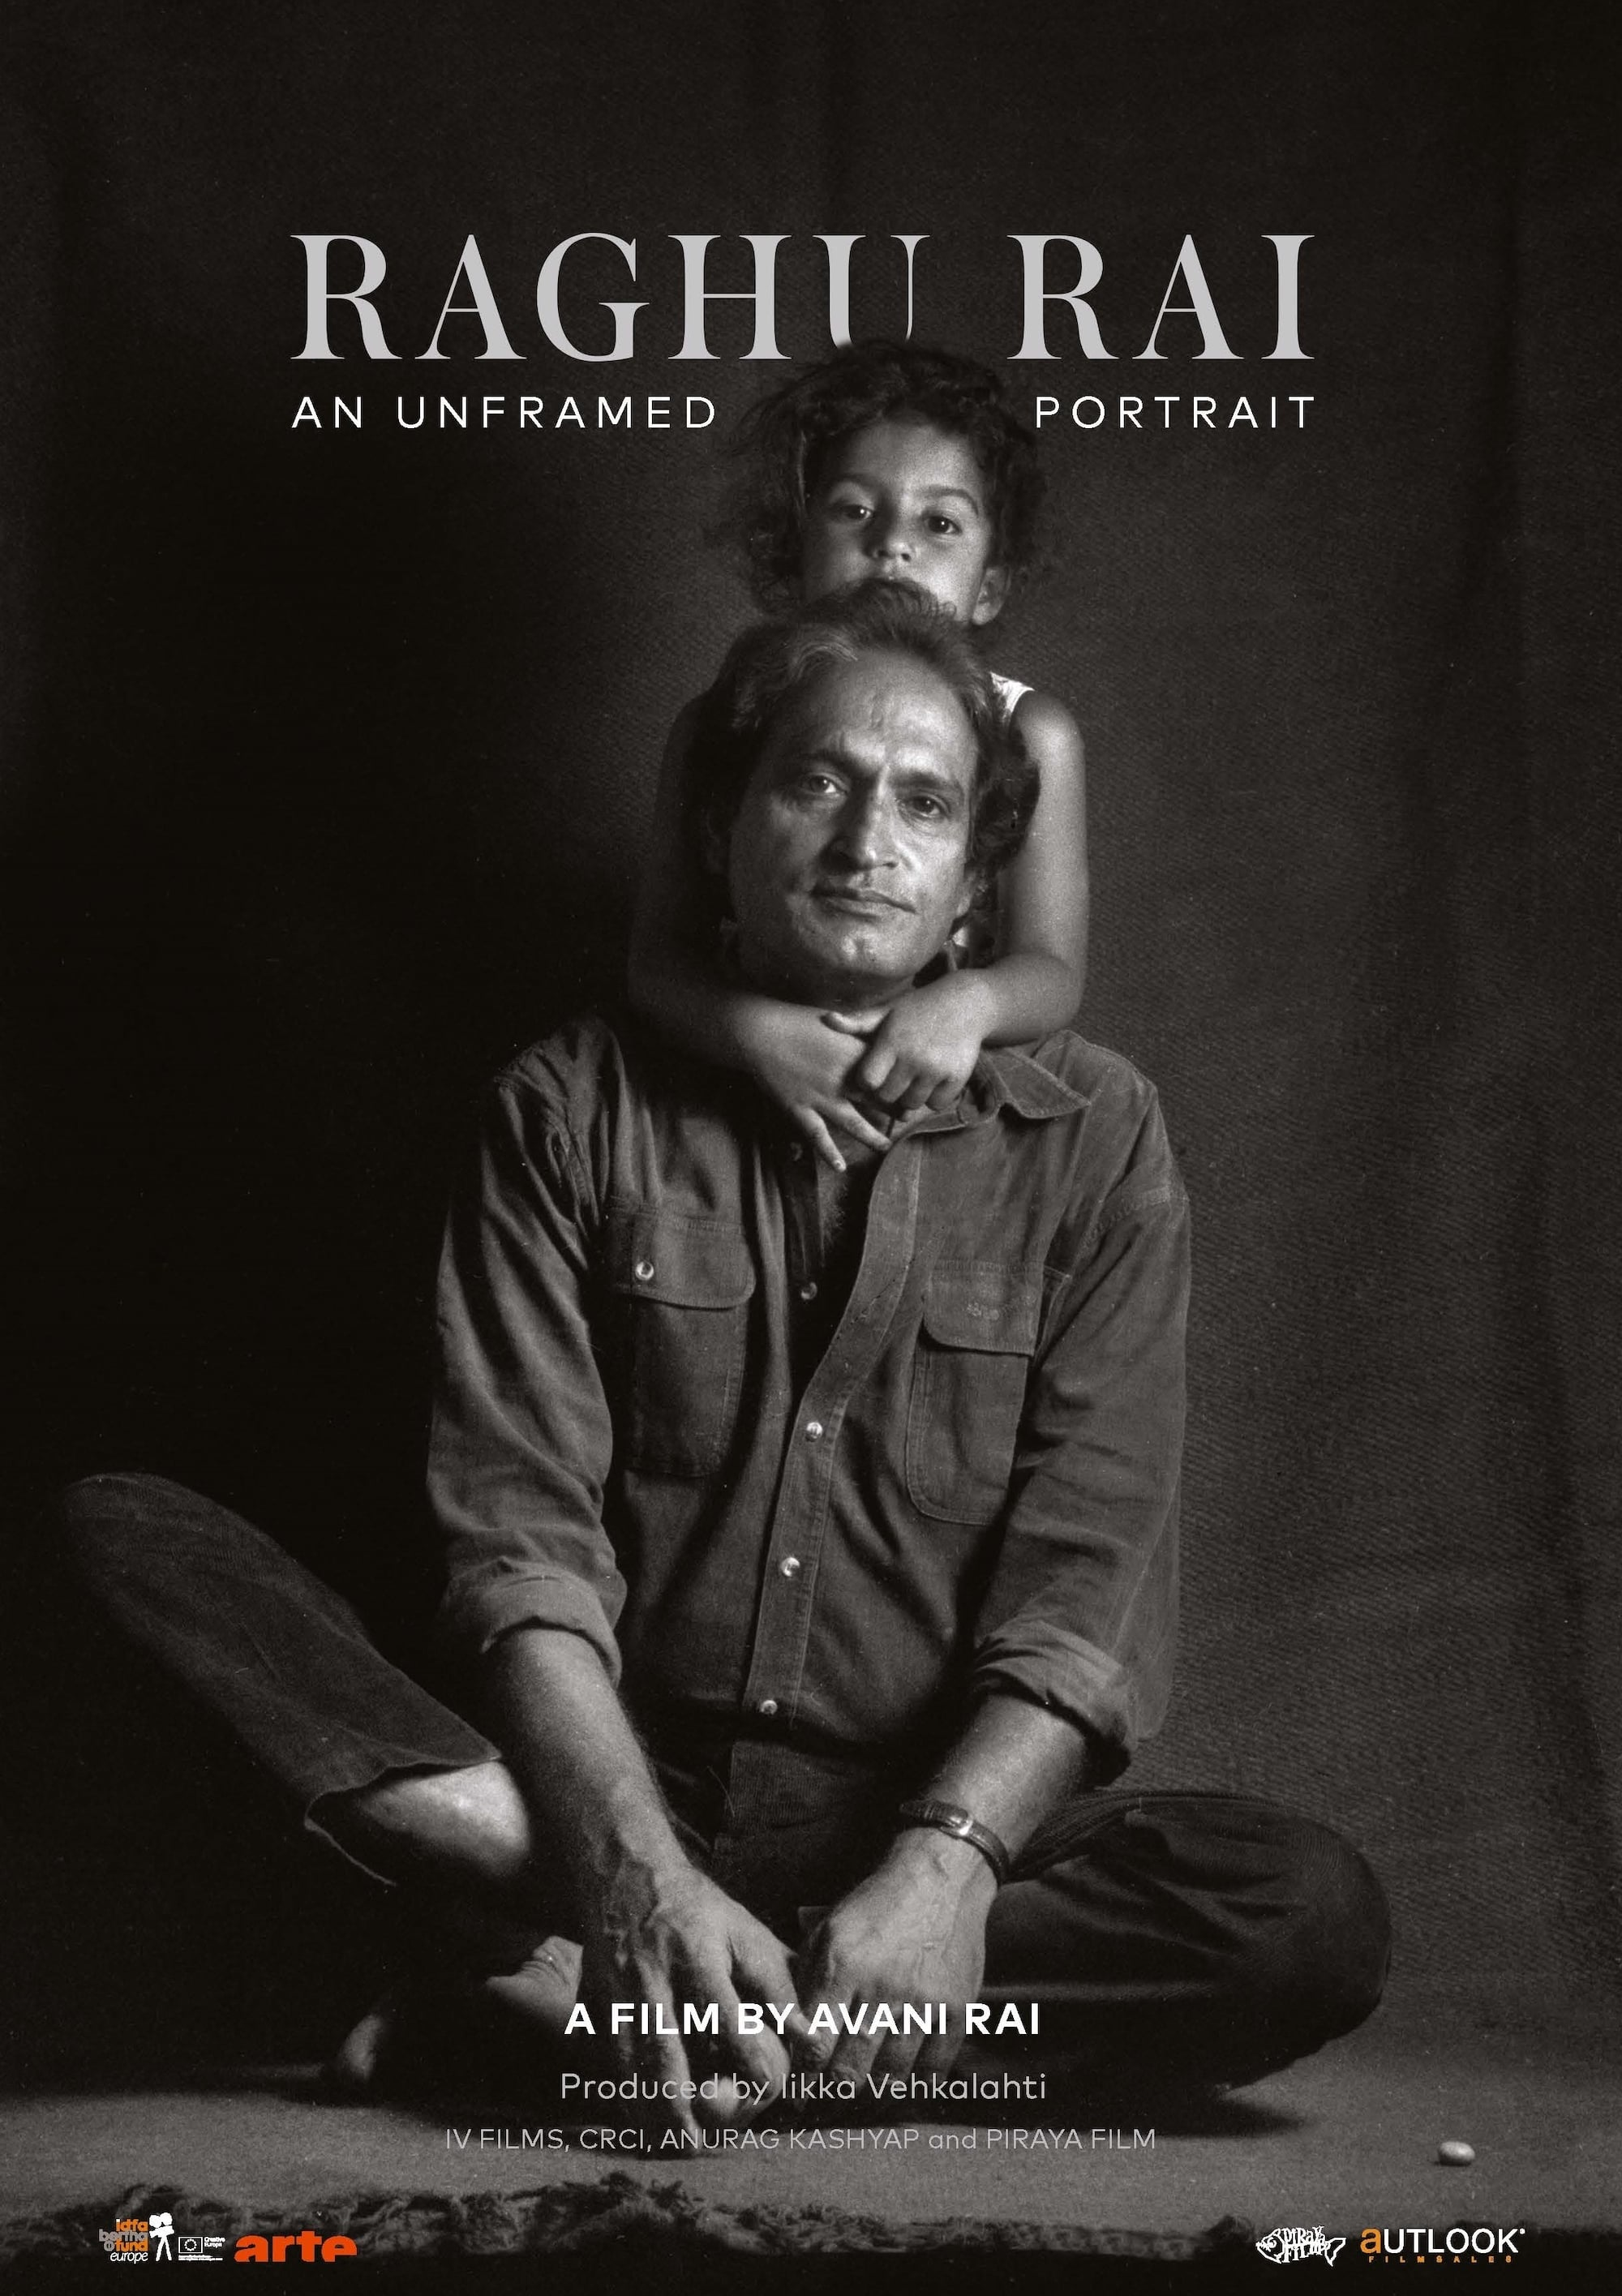 Raghu Rai: An Unframed Portrait (2018)